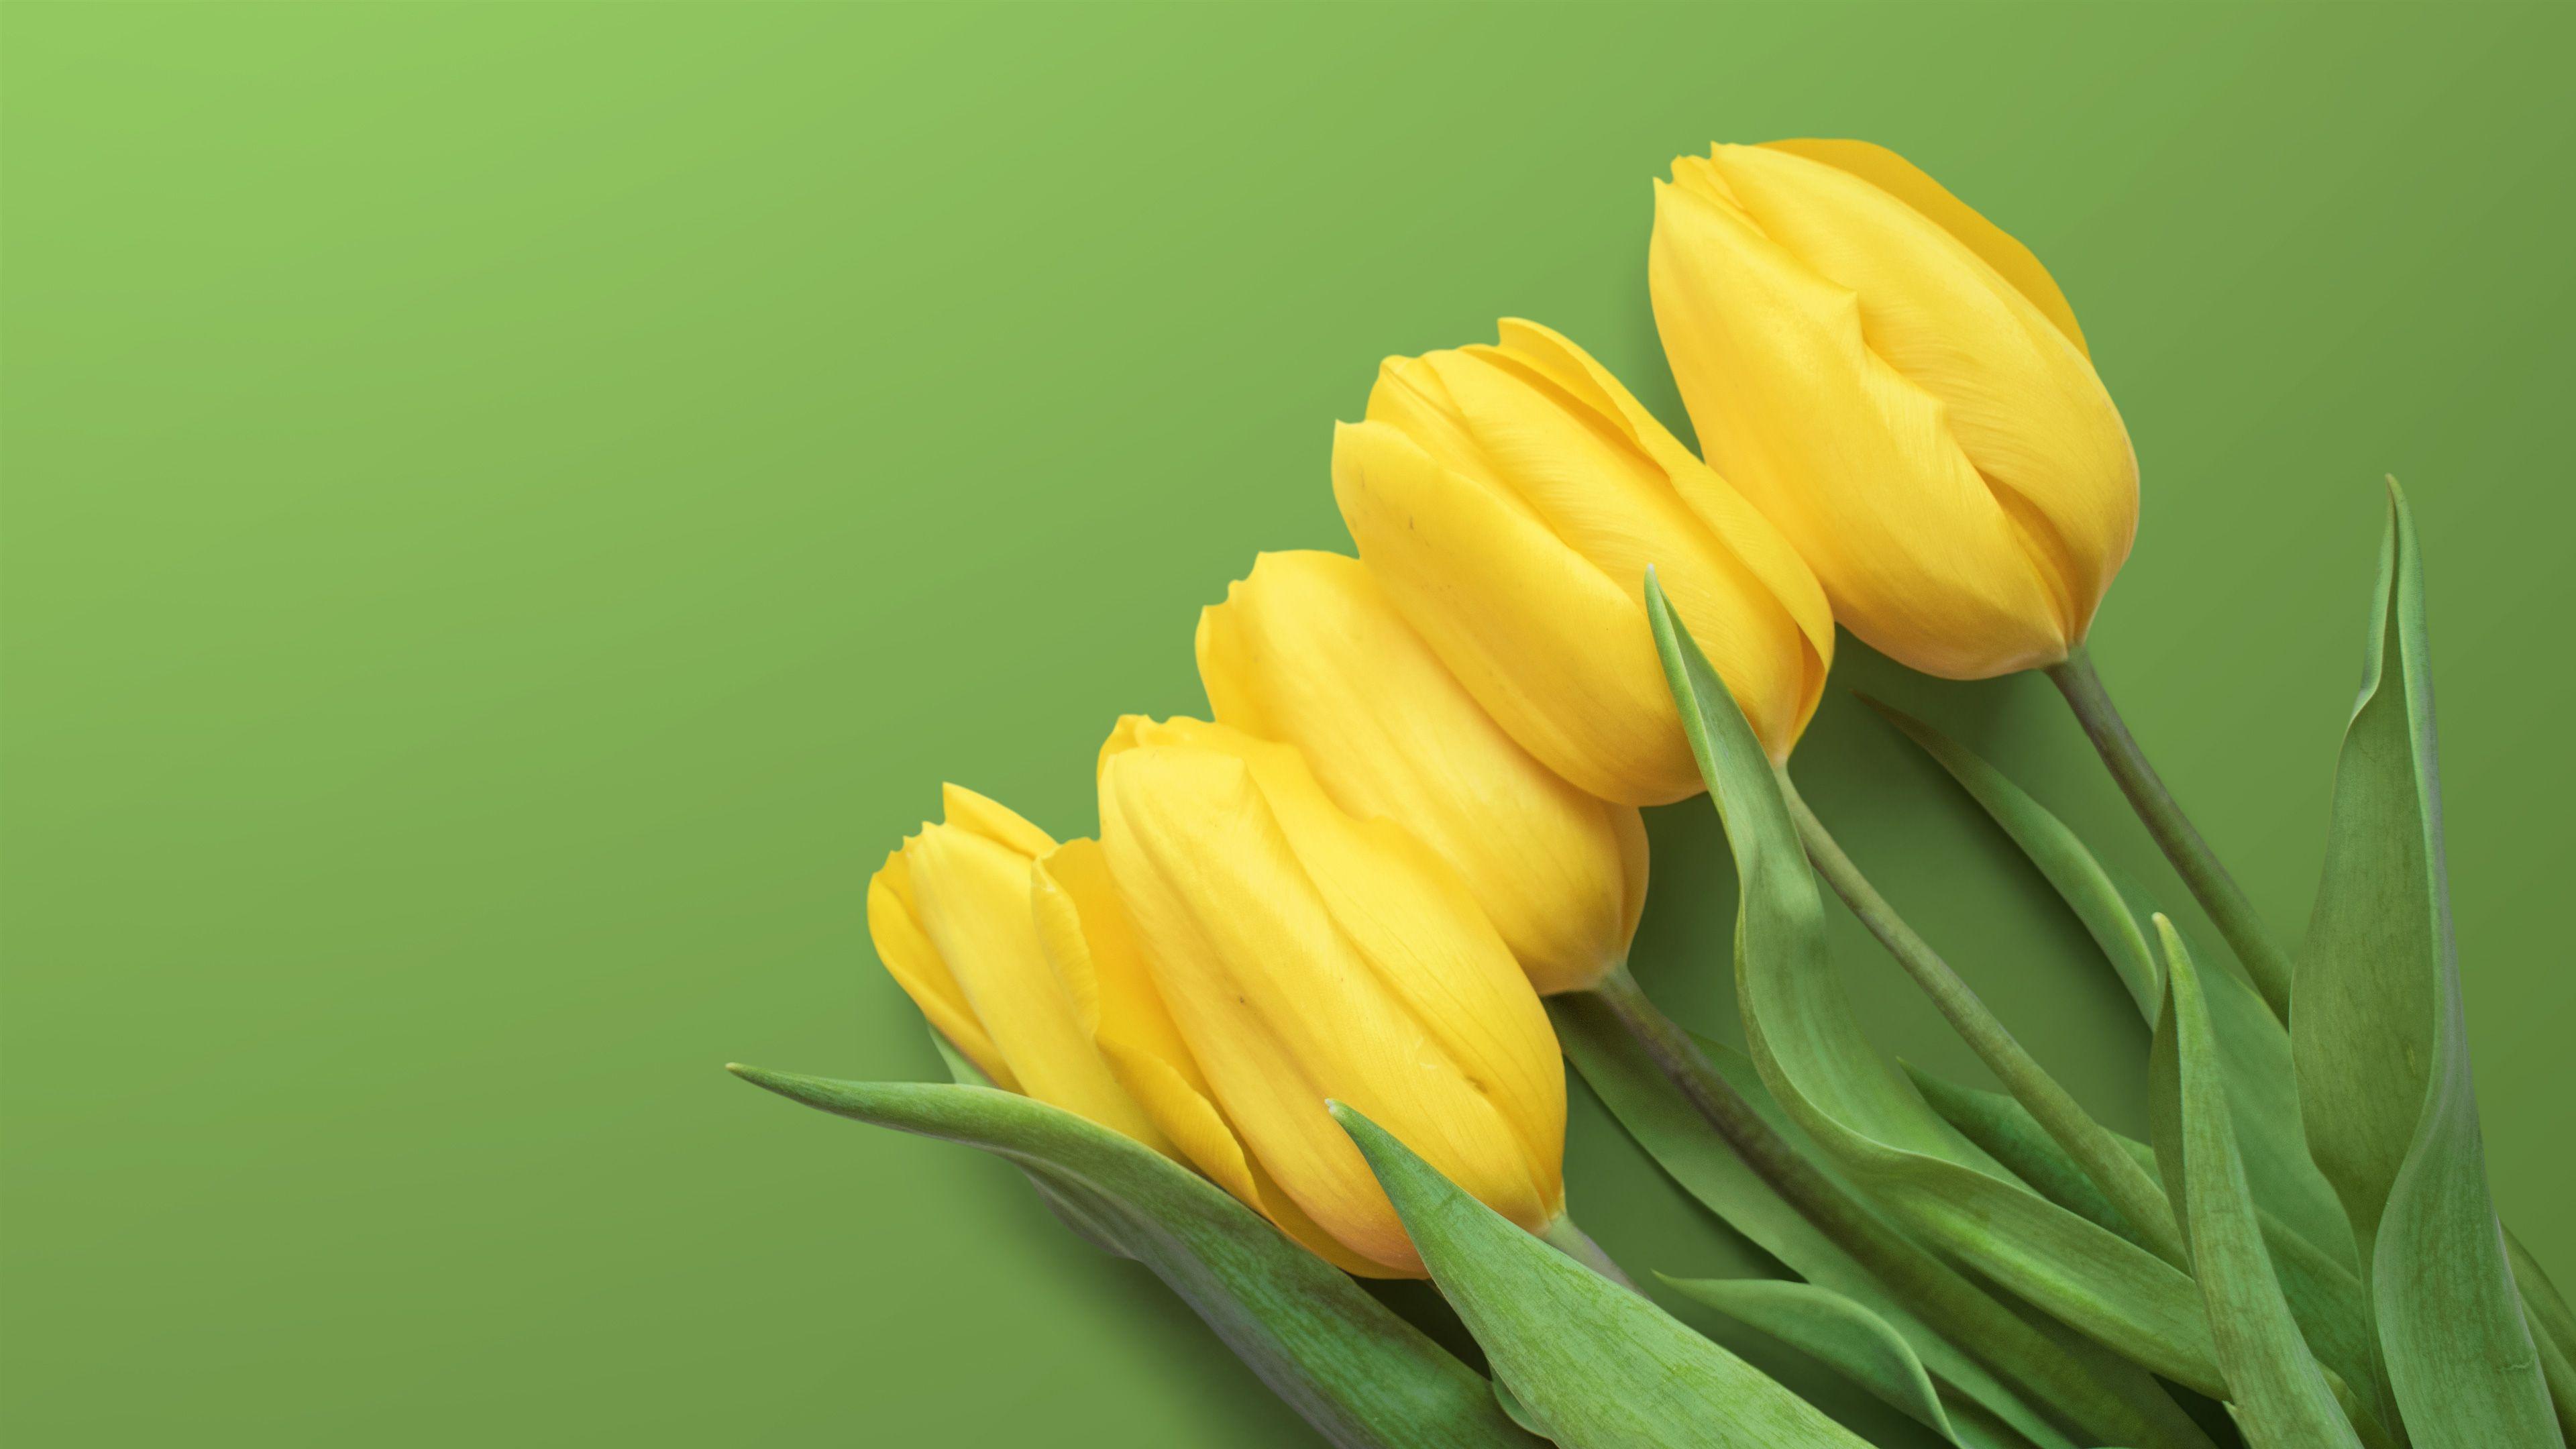 Yellow Tulips 4k Yellow Tulips Tulips Yellow Wallpaper